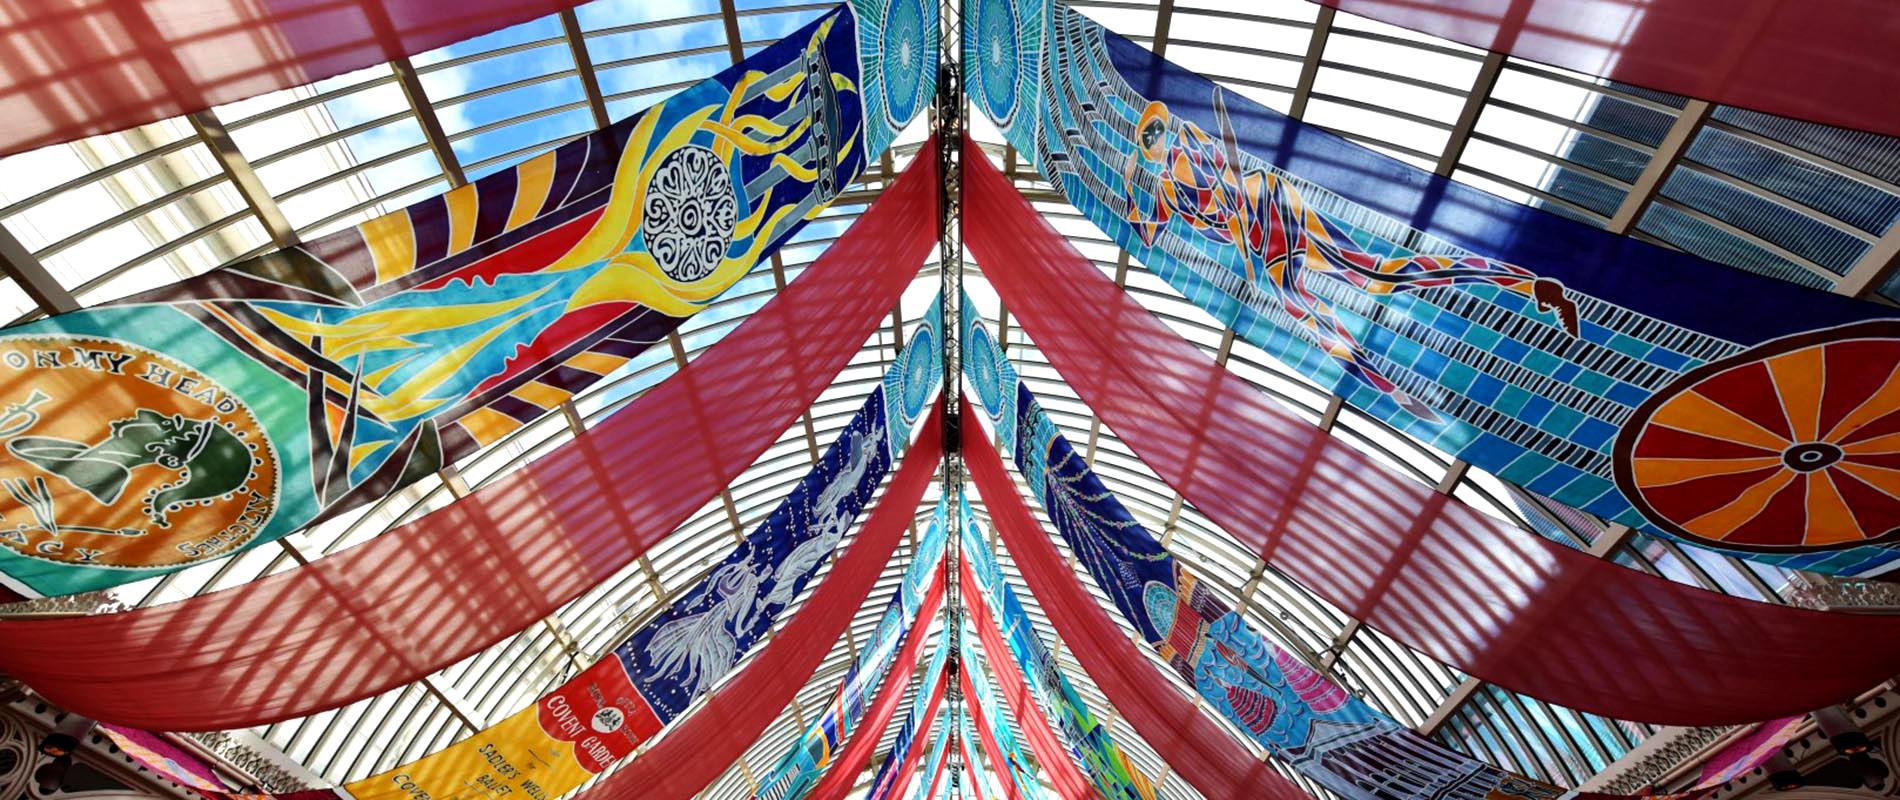 Royal Opera House hand painted silks